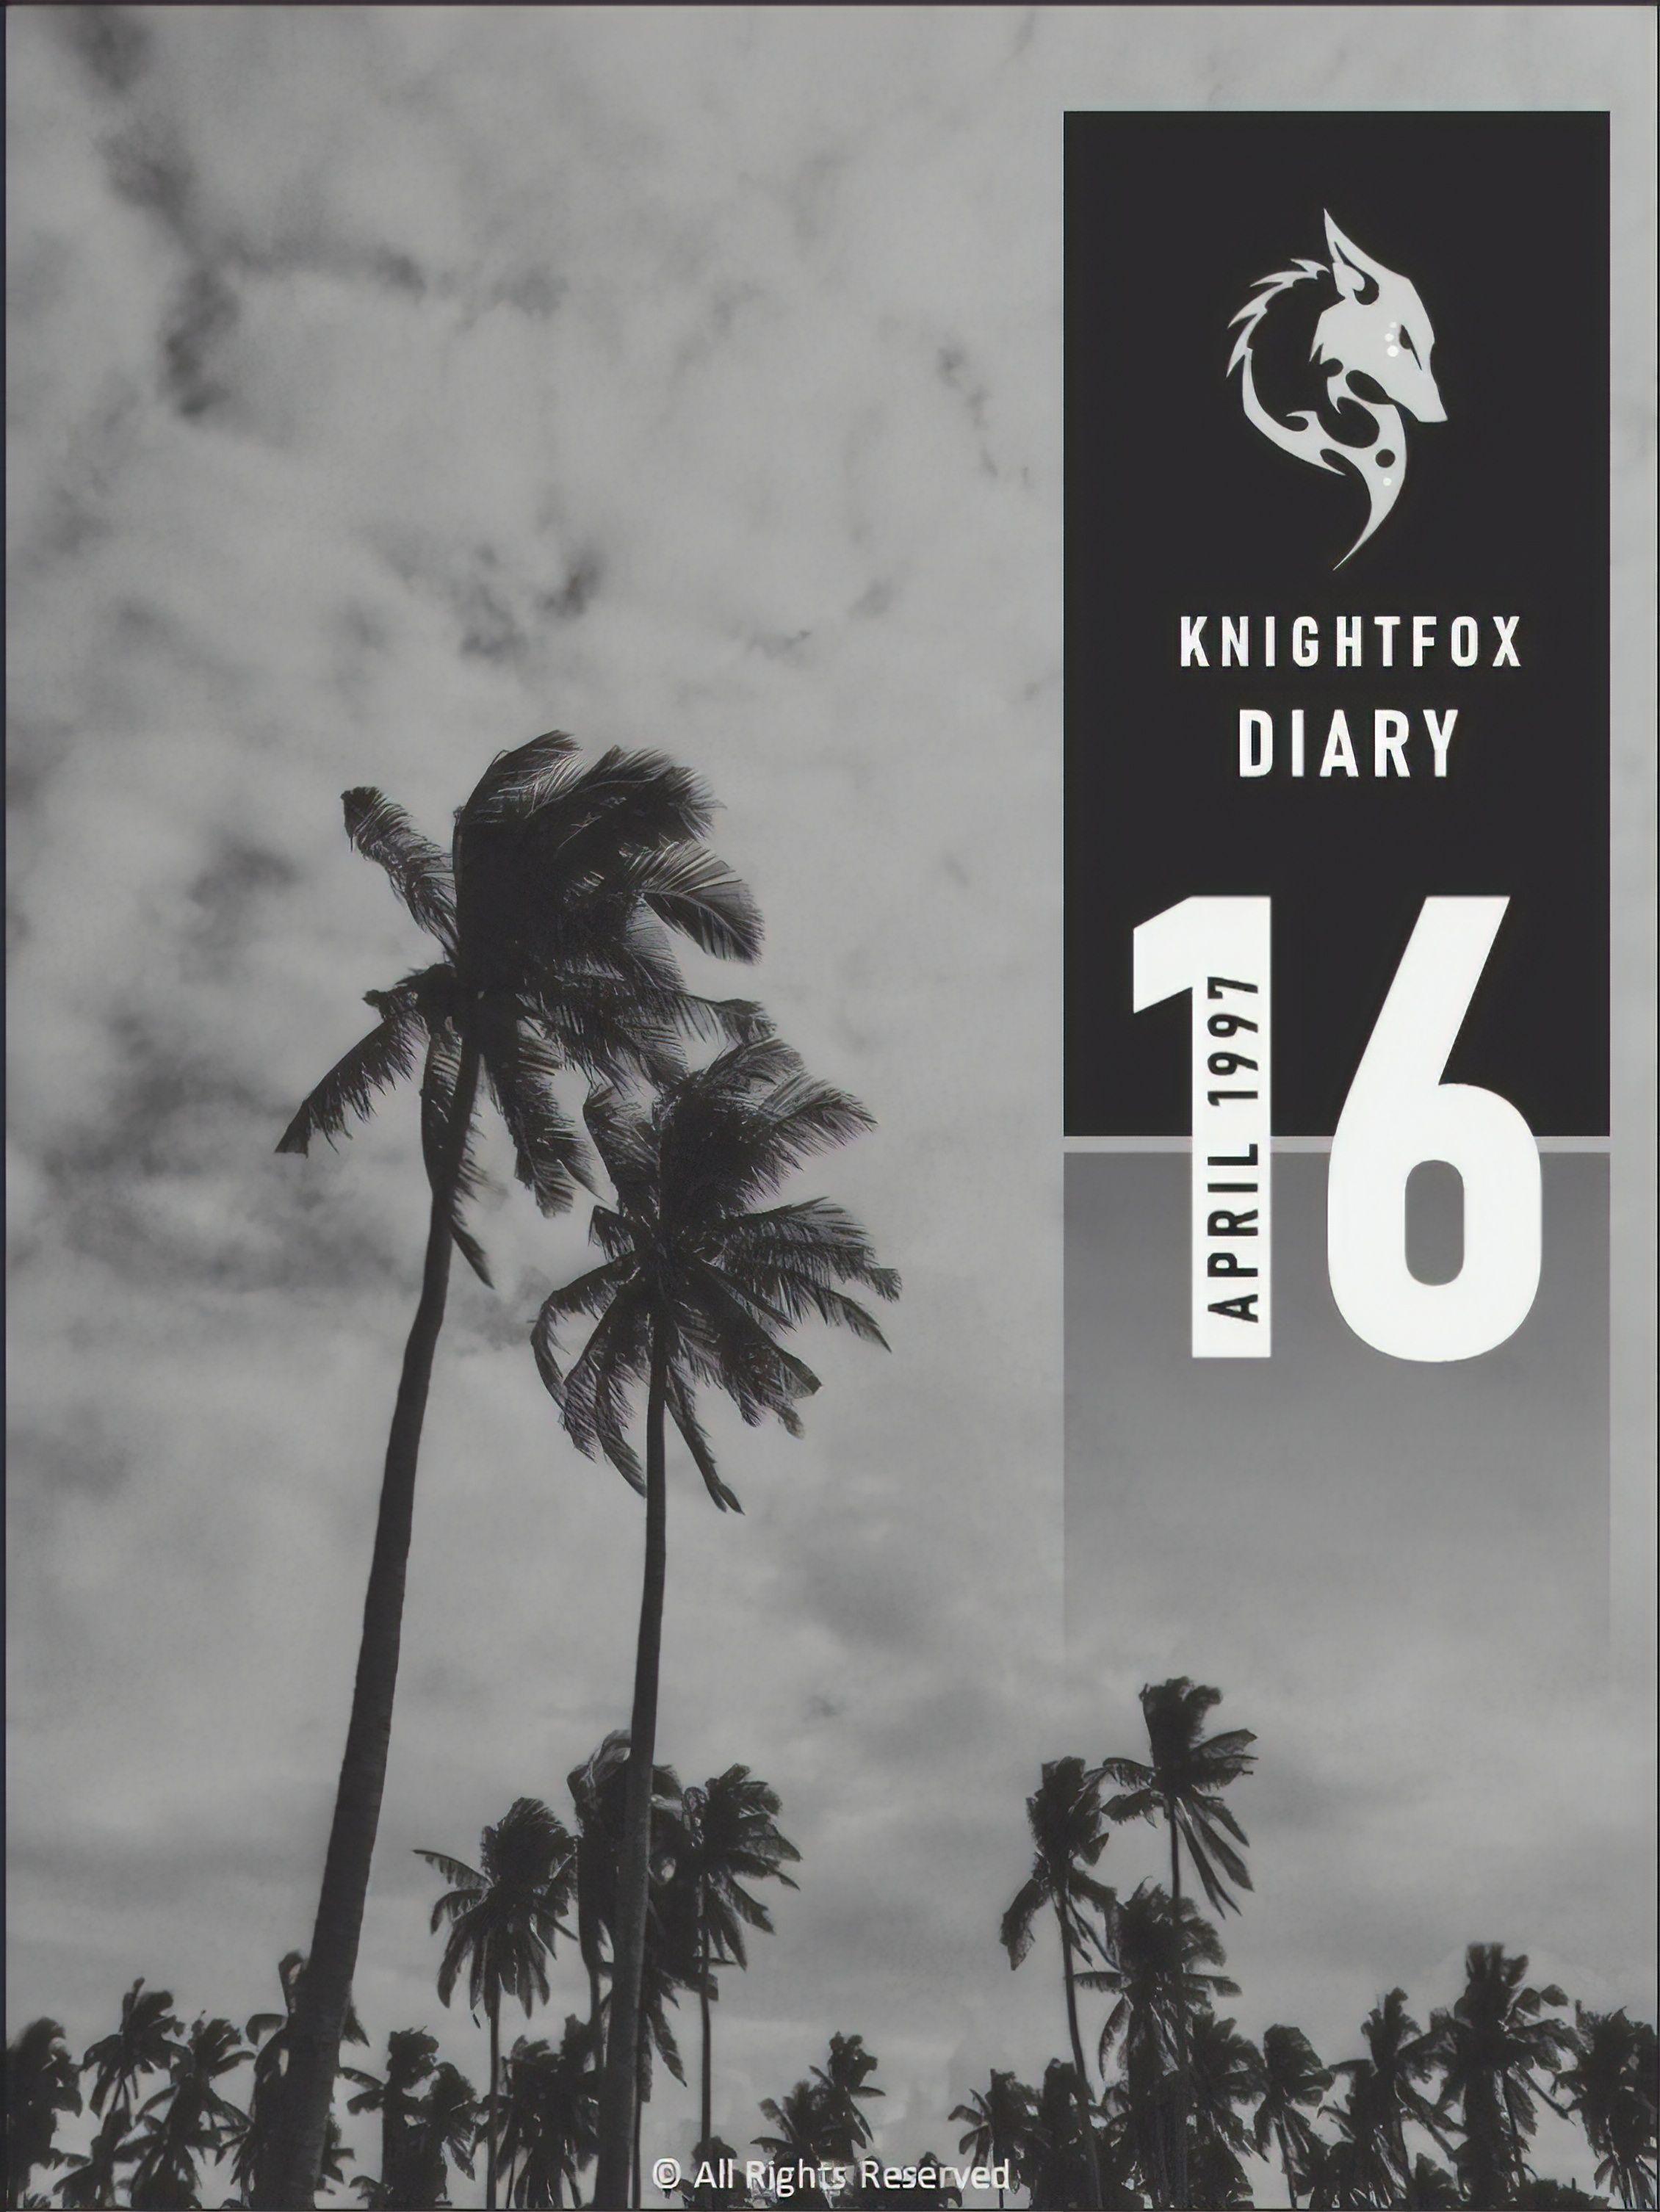 Pin by Knightfox 97 on nightfox in 2020 Diary covers